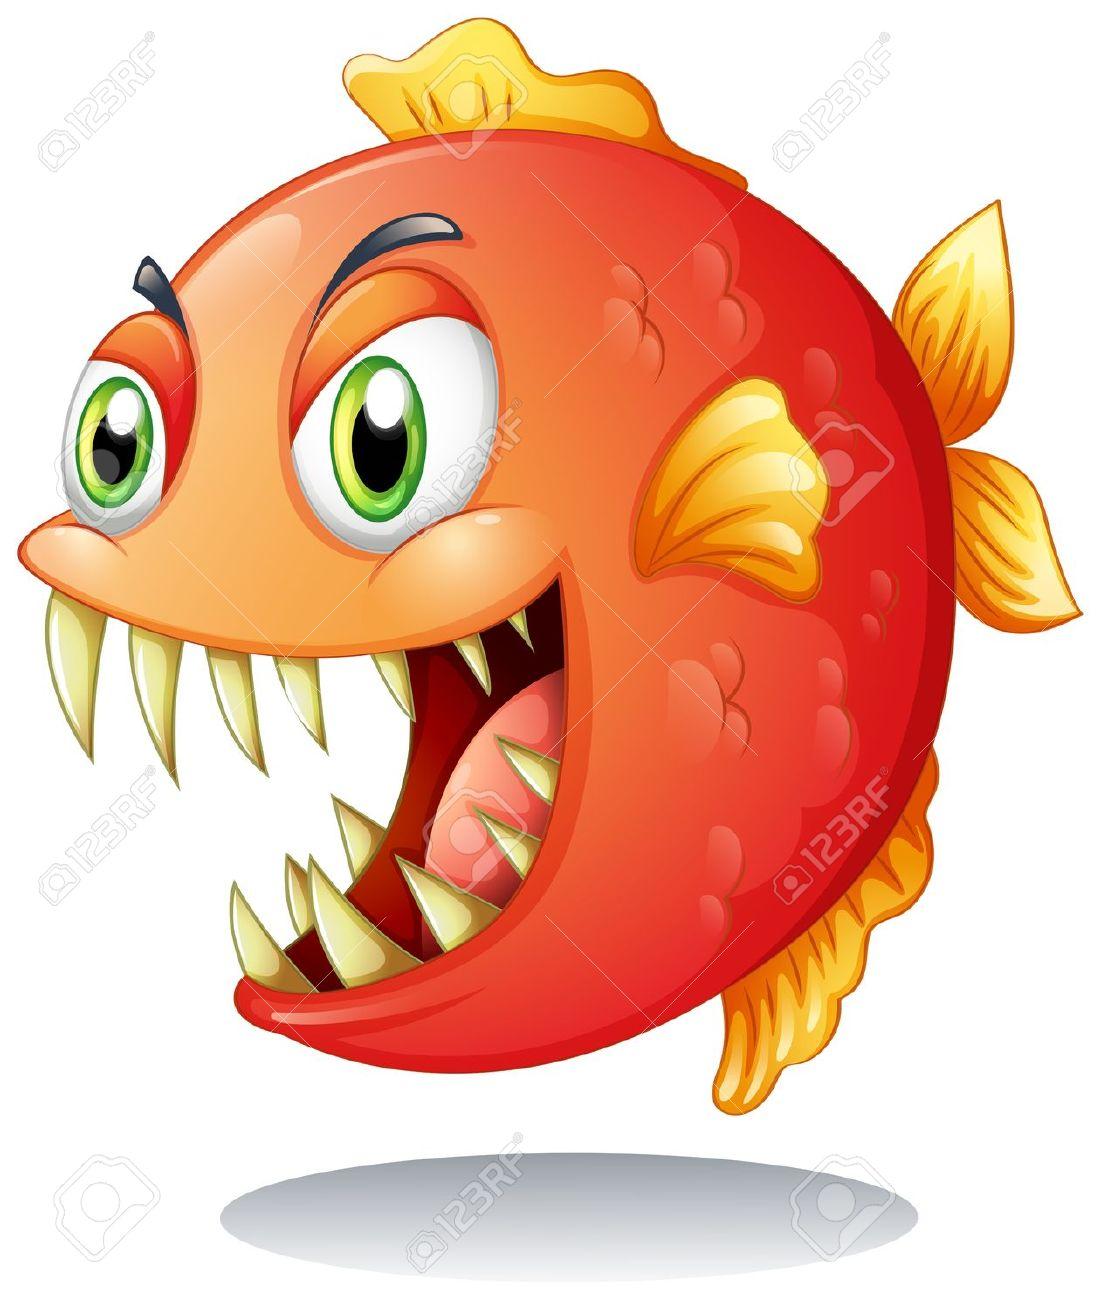 Piranha clipart #12